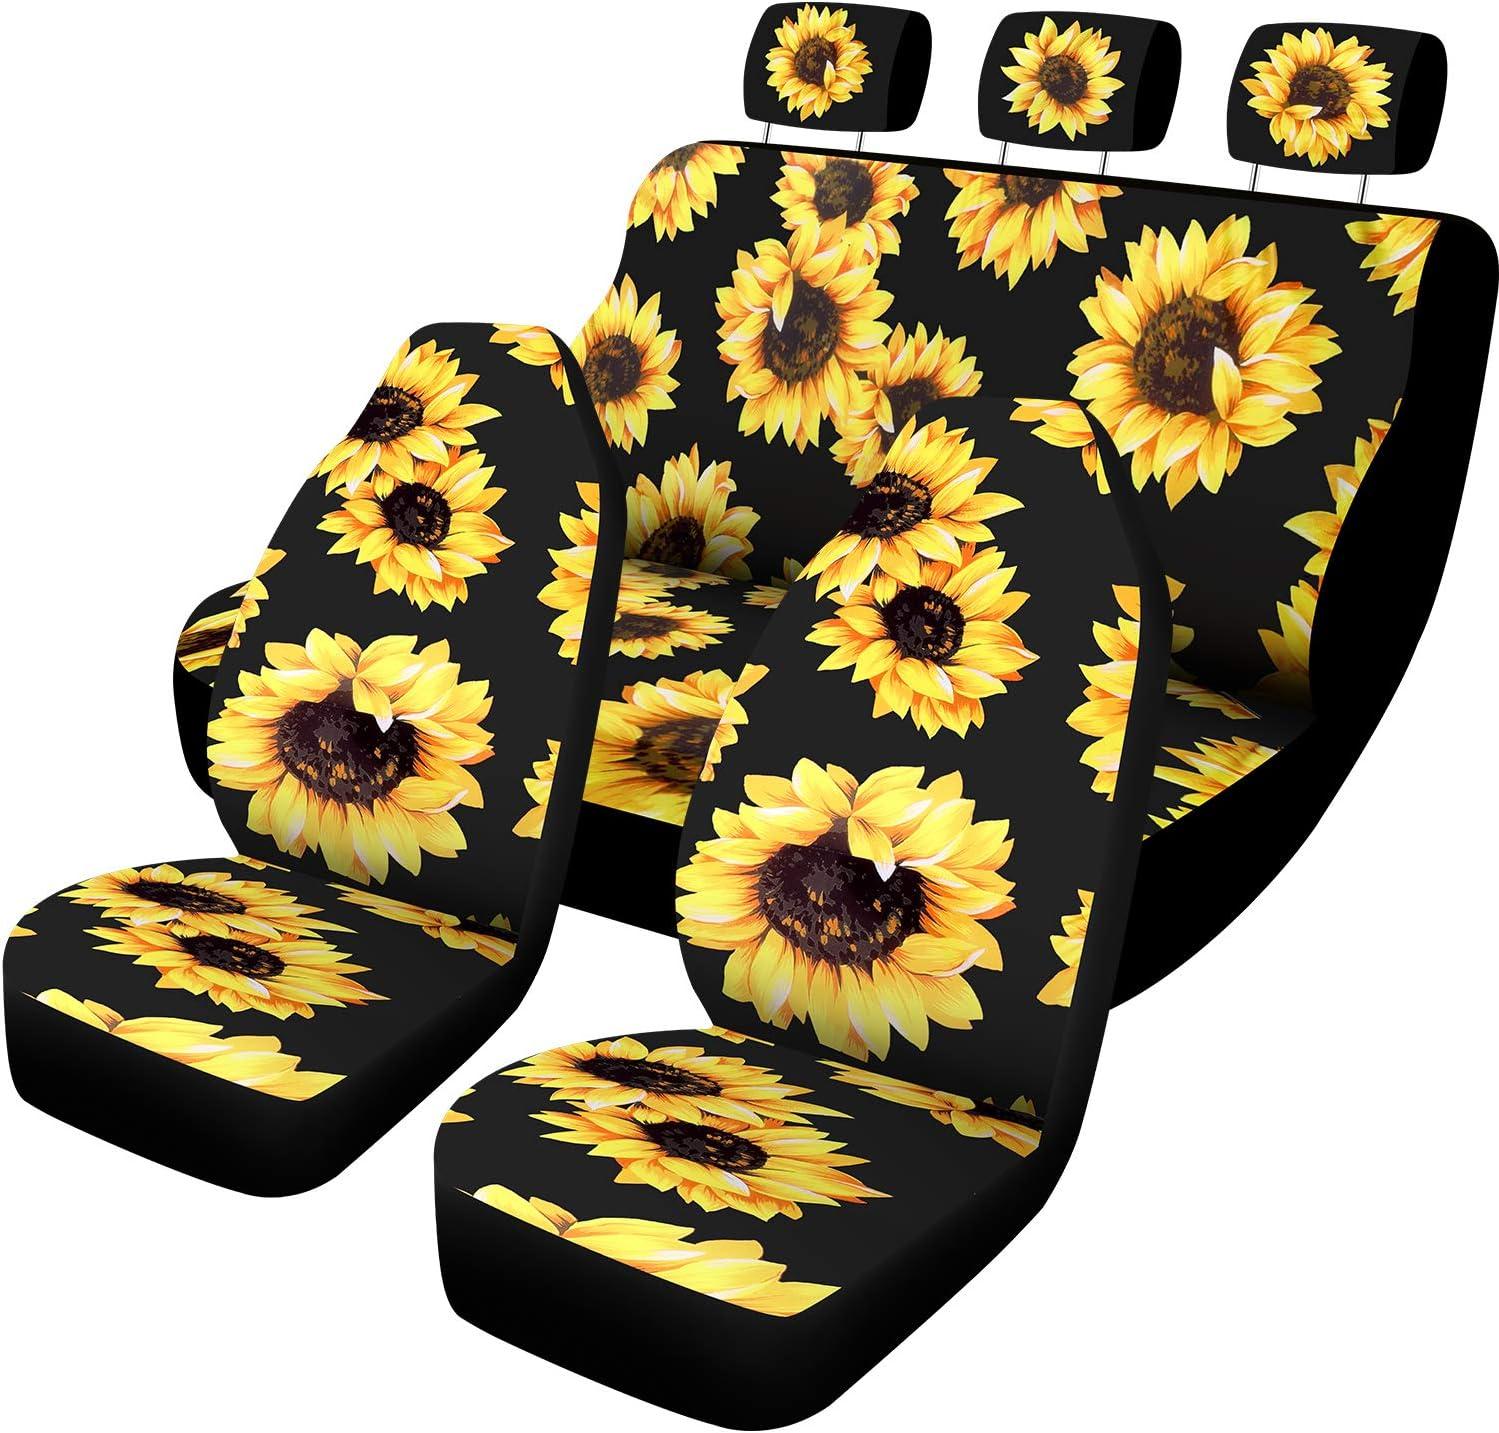 BBTO 7 Pieces Sunflower Car Accessories Set Sunflower Car Seat Covers for Auto Car Decoration